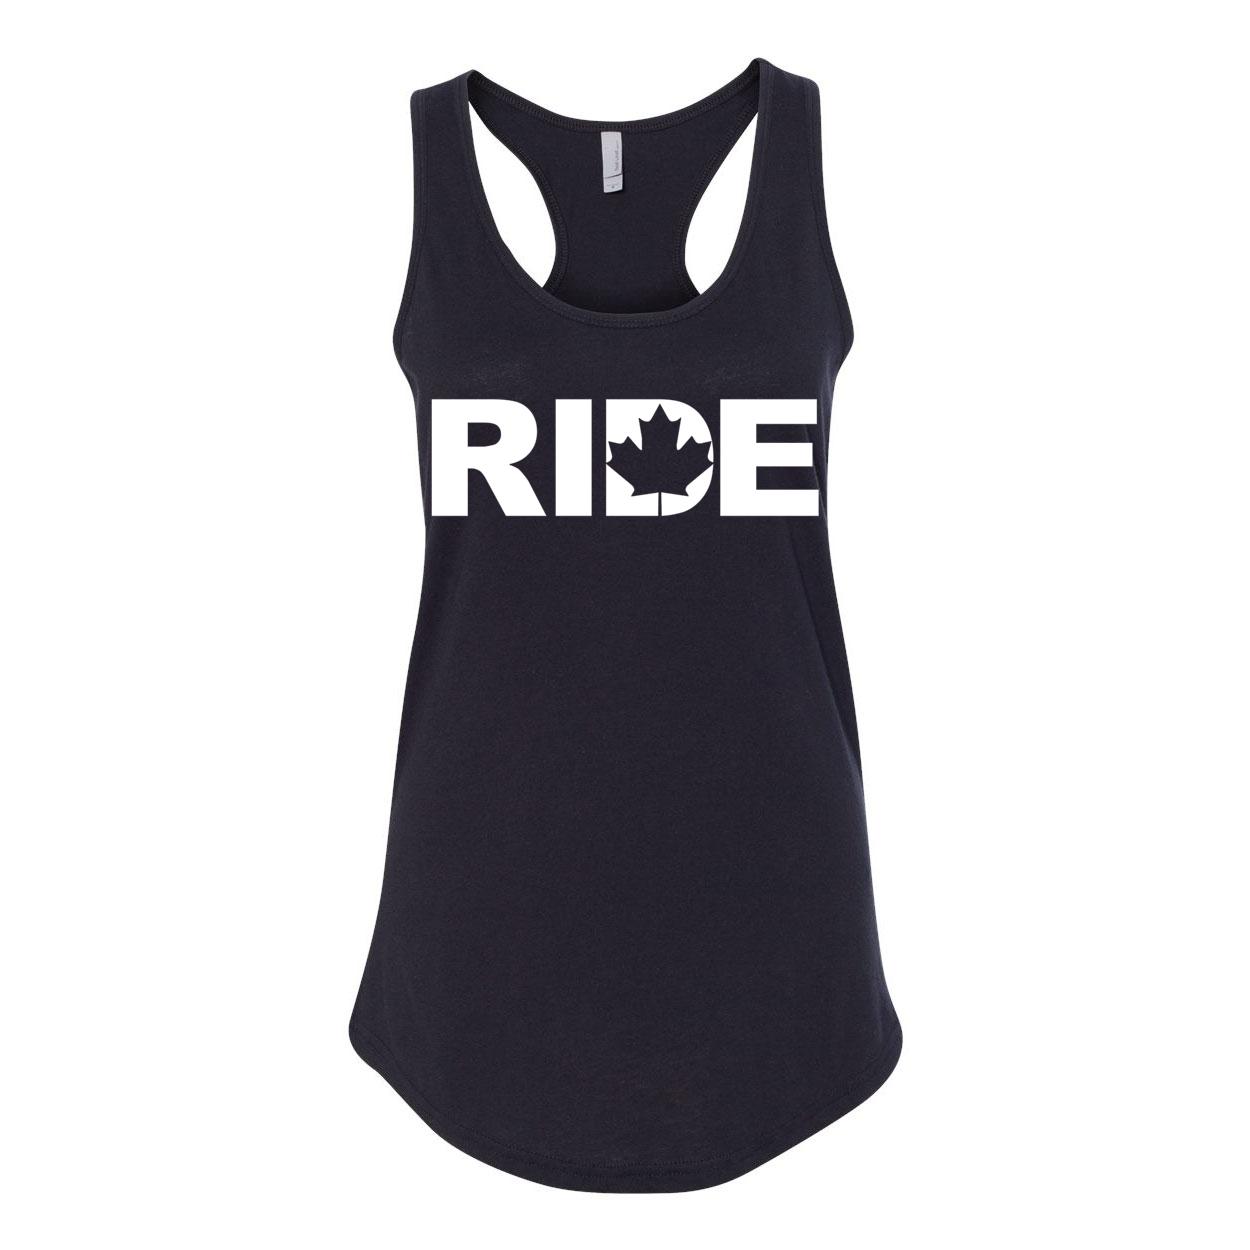 Ride Canada Classic Women's Racerback Tank Top Black (White Logo)